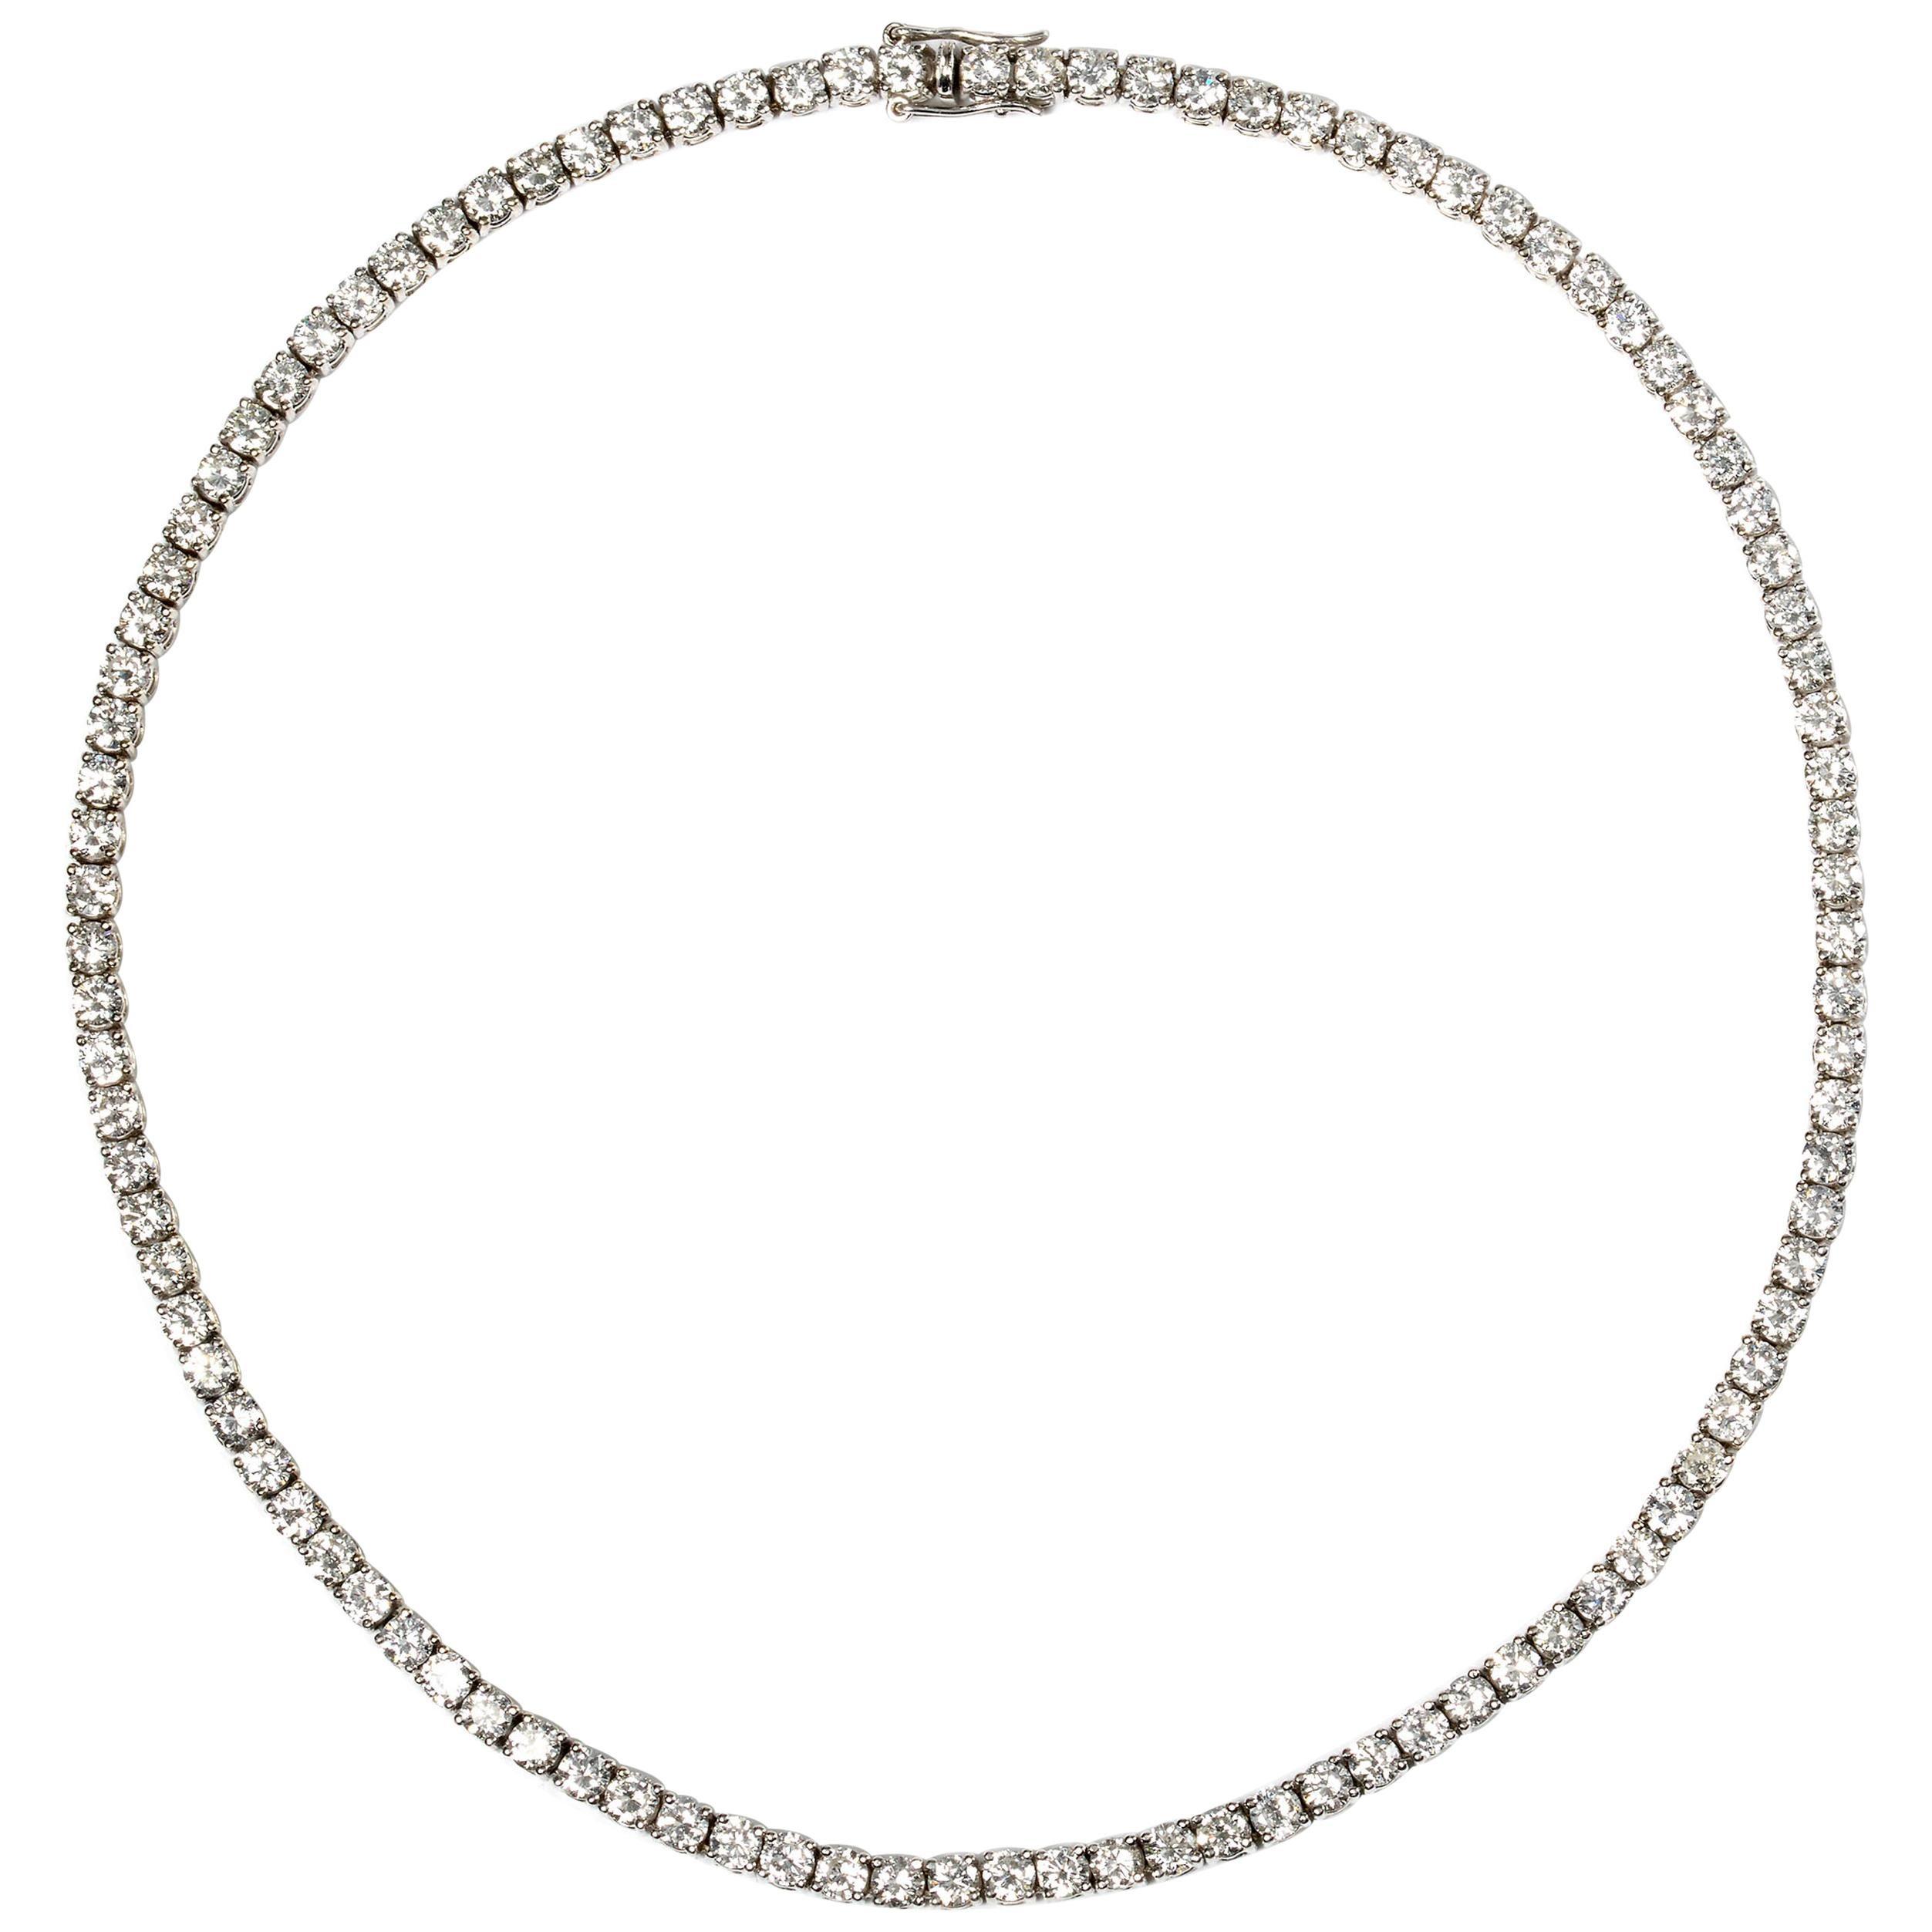 18.30 Carat Diamond Riviere Necklace